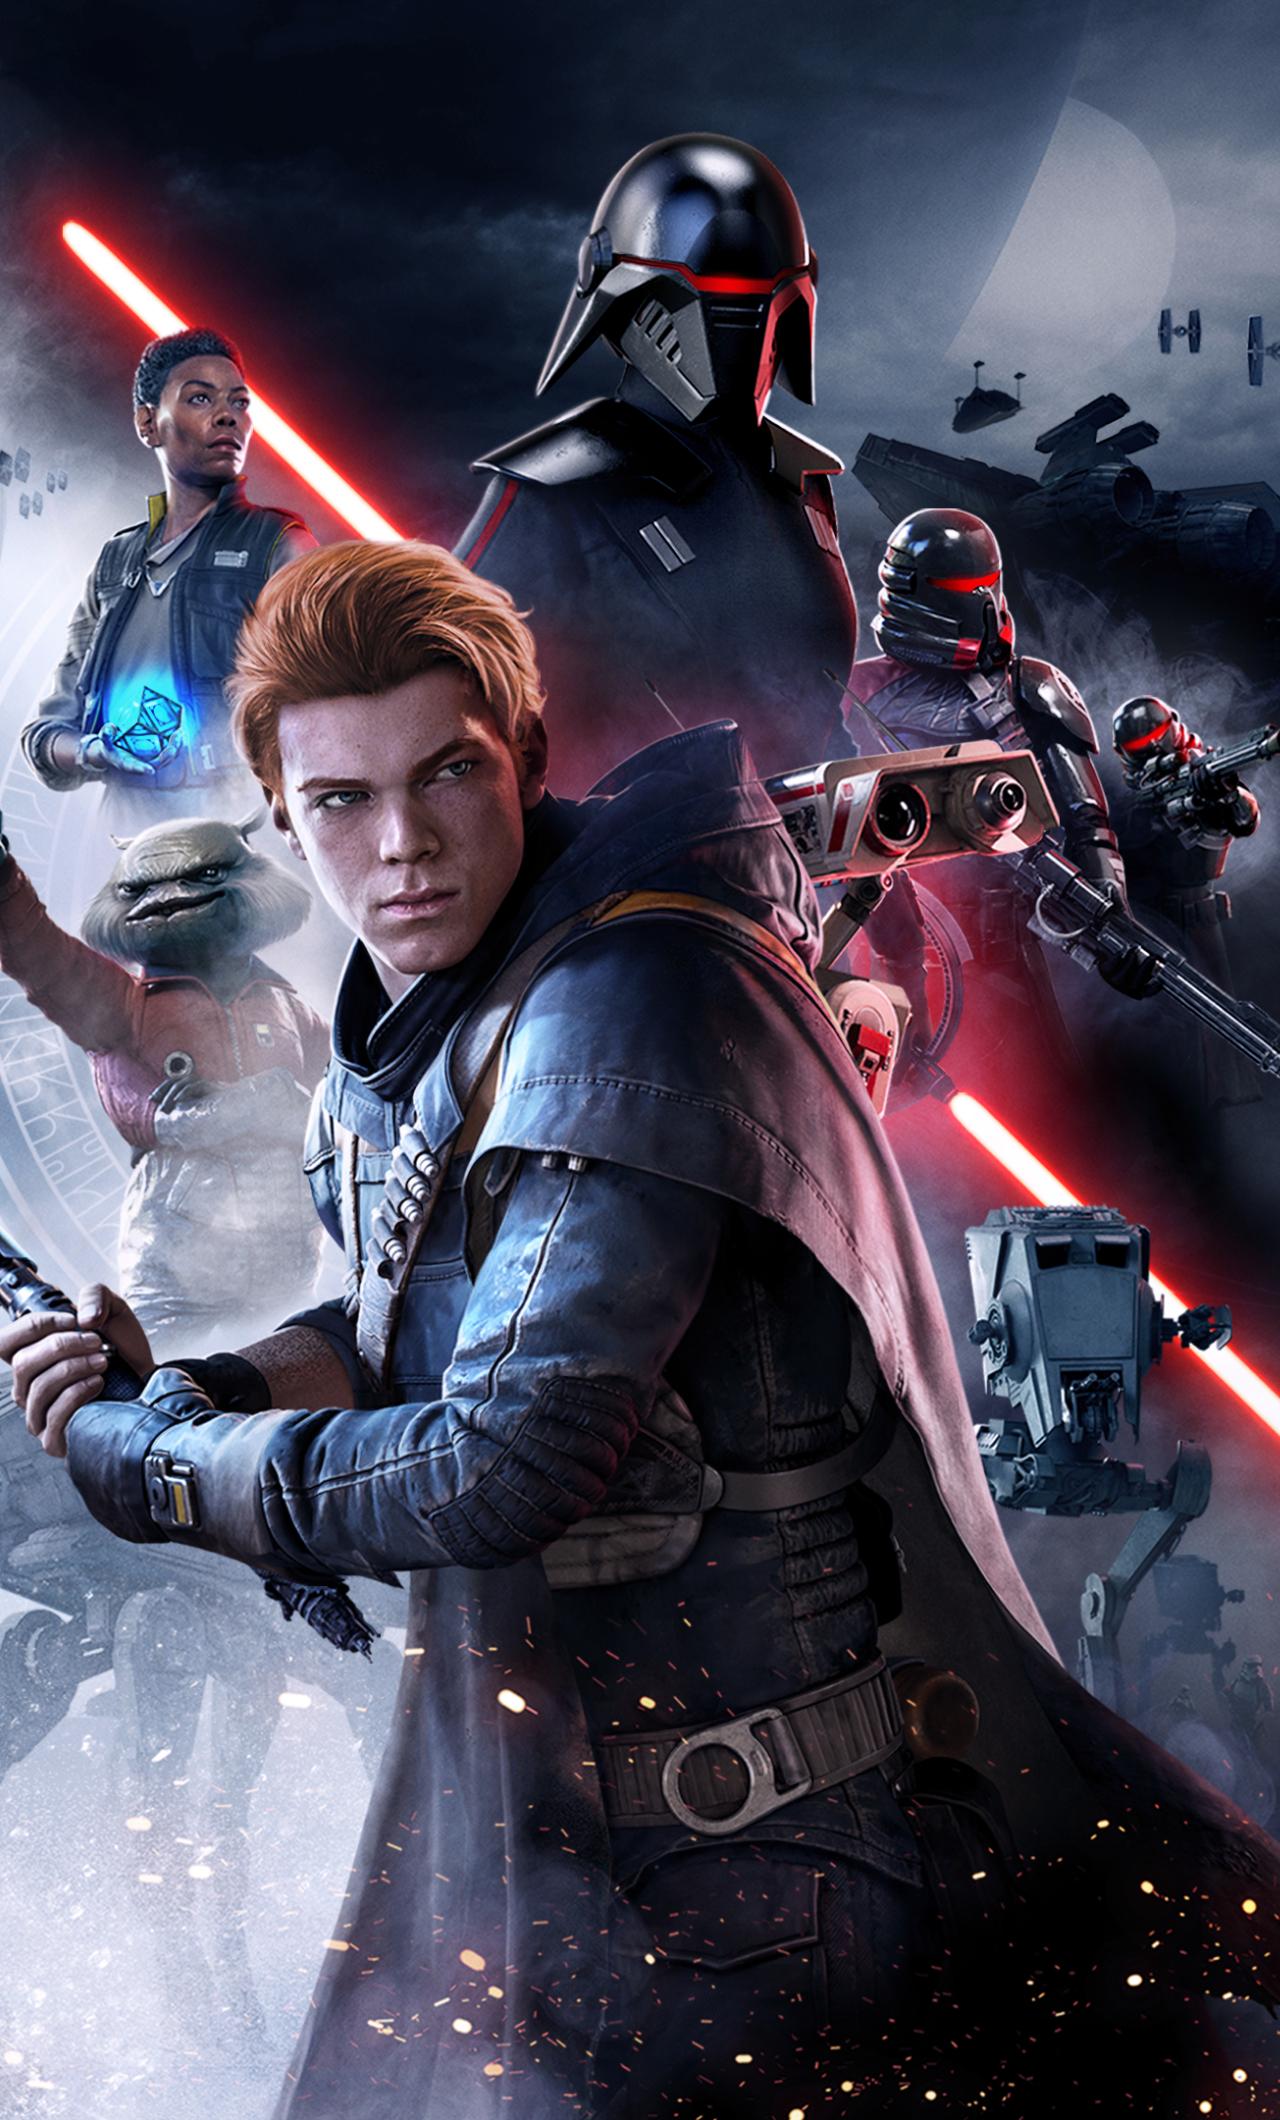 1280x2120 Star Wars Jedi Fallen Order Poster 2019 Iphone 6 Plus